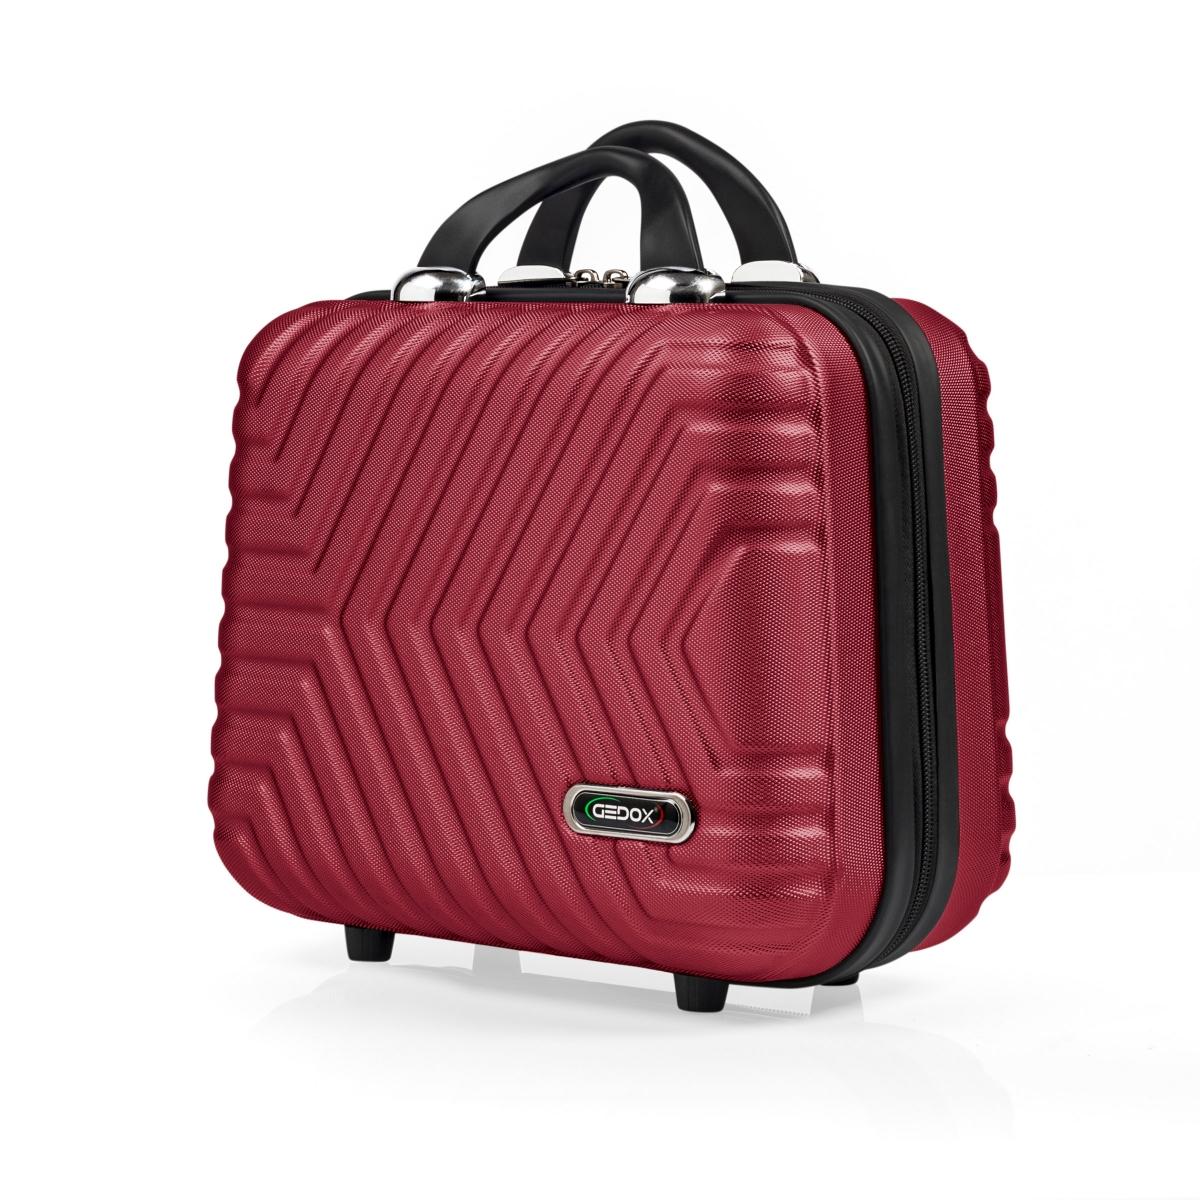 G&D Polo Suitcase Abs Makyaj&Hostes El Çantası Model:615.13 Bordo